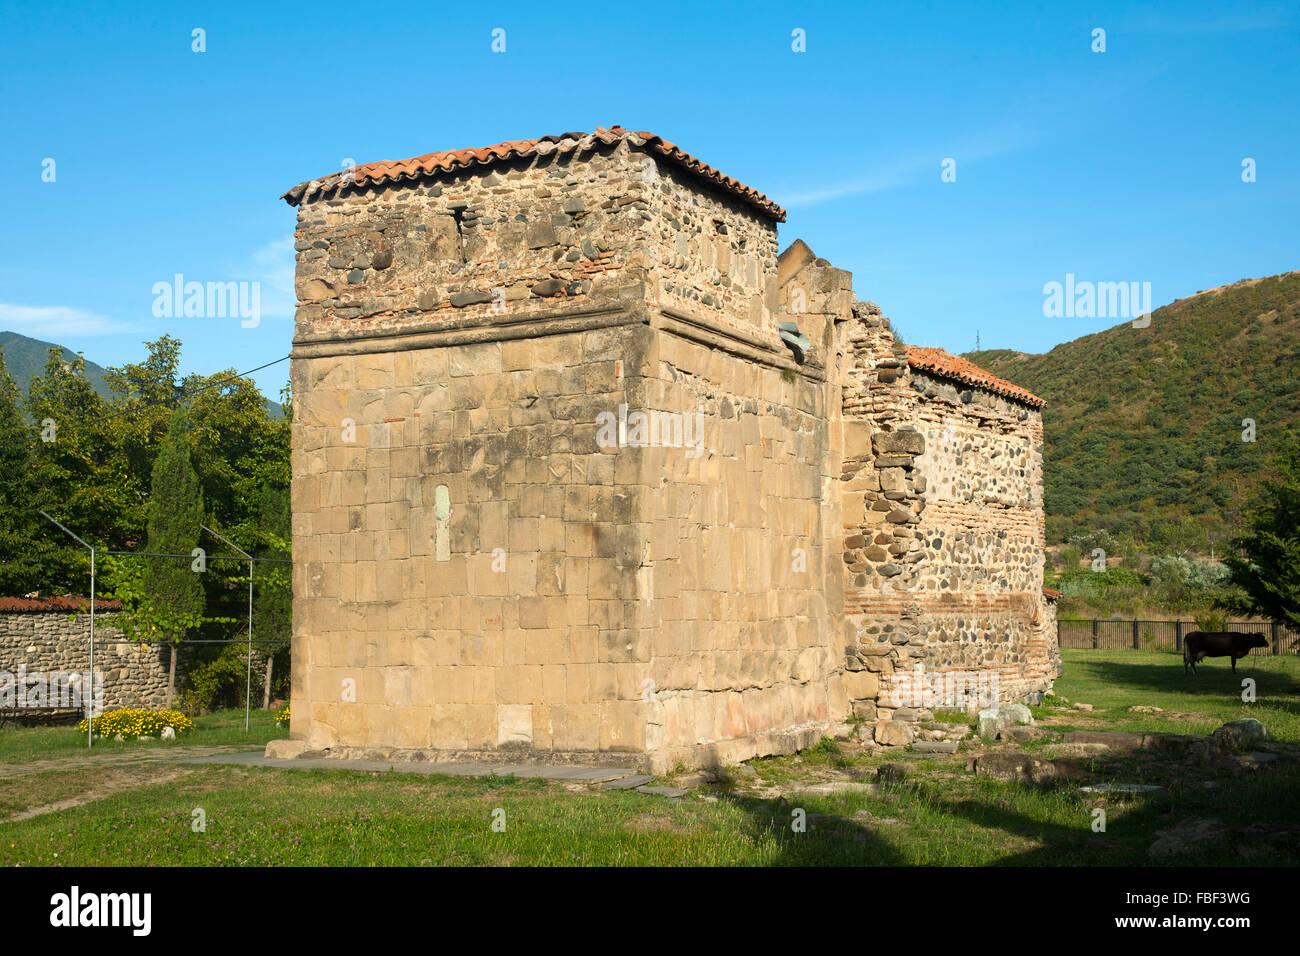 Georgien, Mtskheta, Antiochia-Kirche - Stock Image